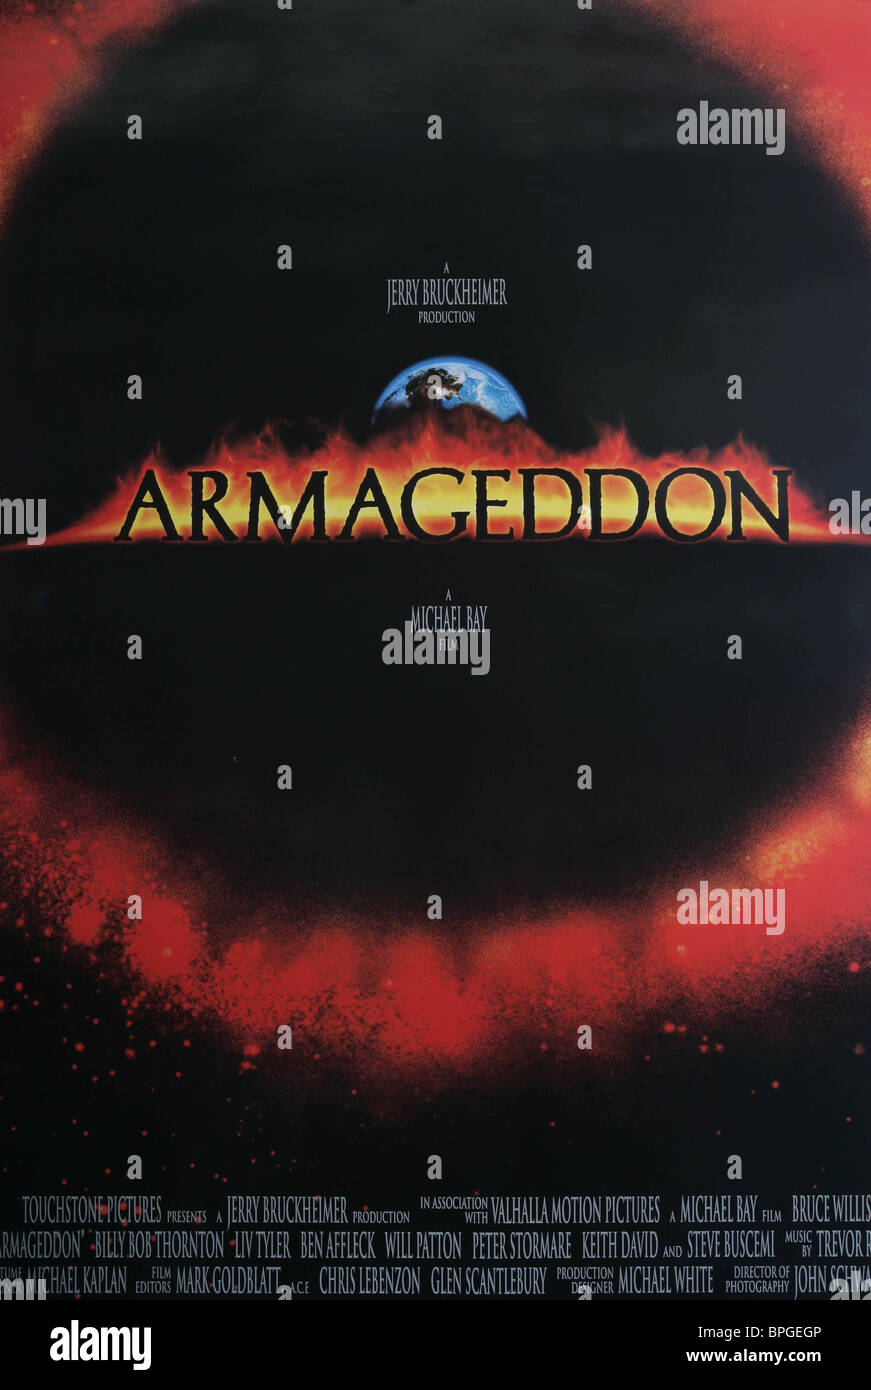 FILM POSTER ARMAGEDDON (1998) - Stock Image